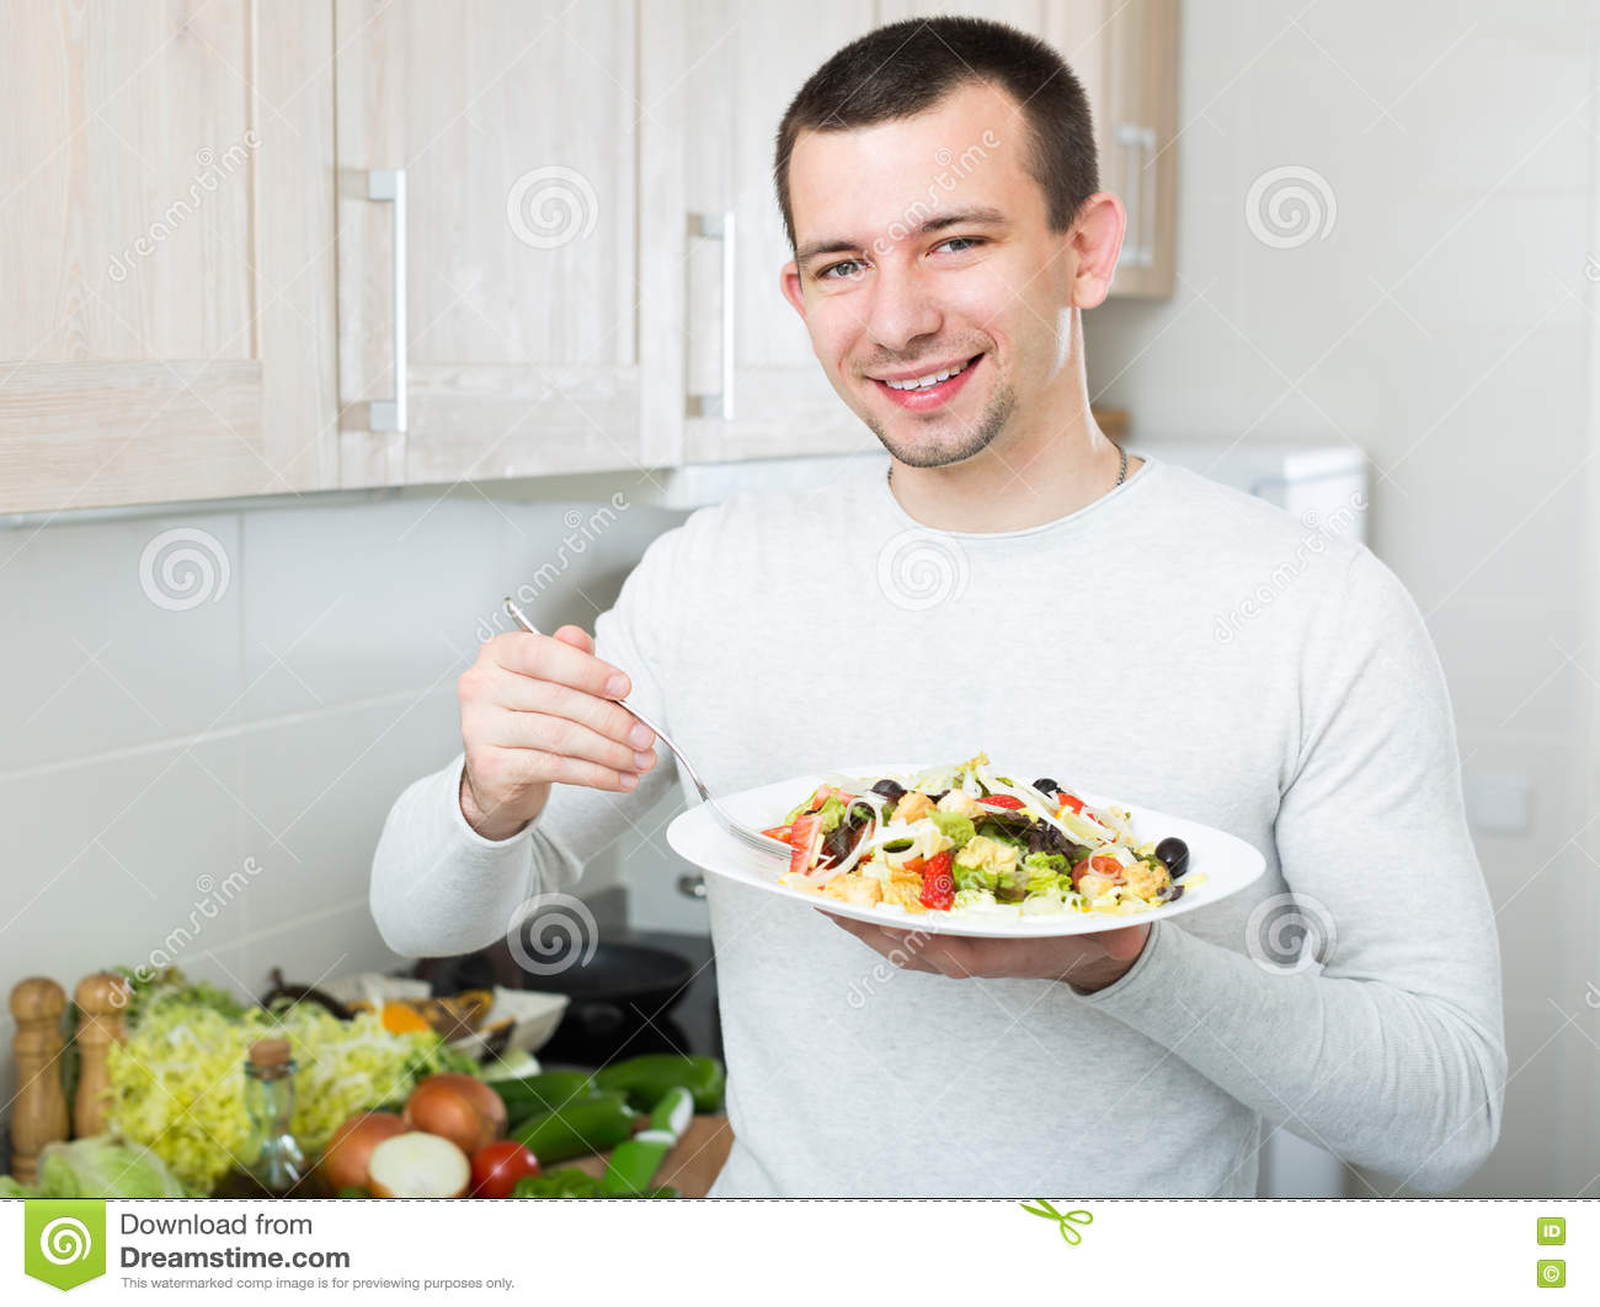 Insalata Di Verdure Mangiatrice Di Uomini In Cucina Immagine Stock Immagine Di Casuale Alimento 77473245